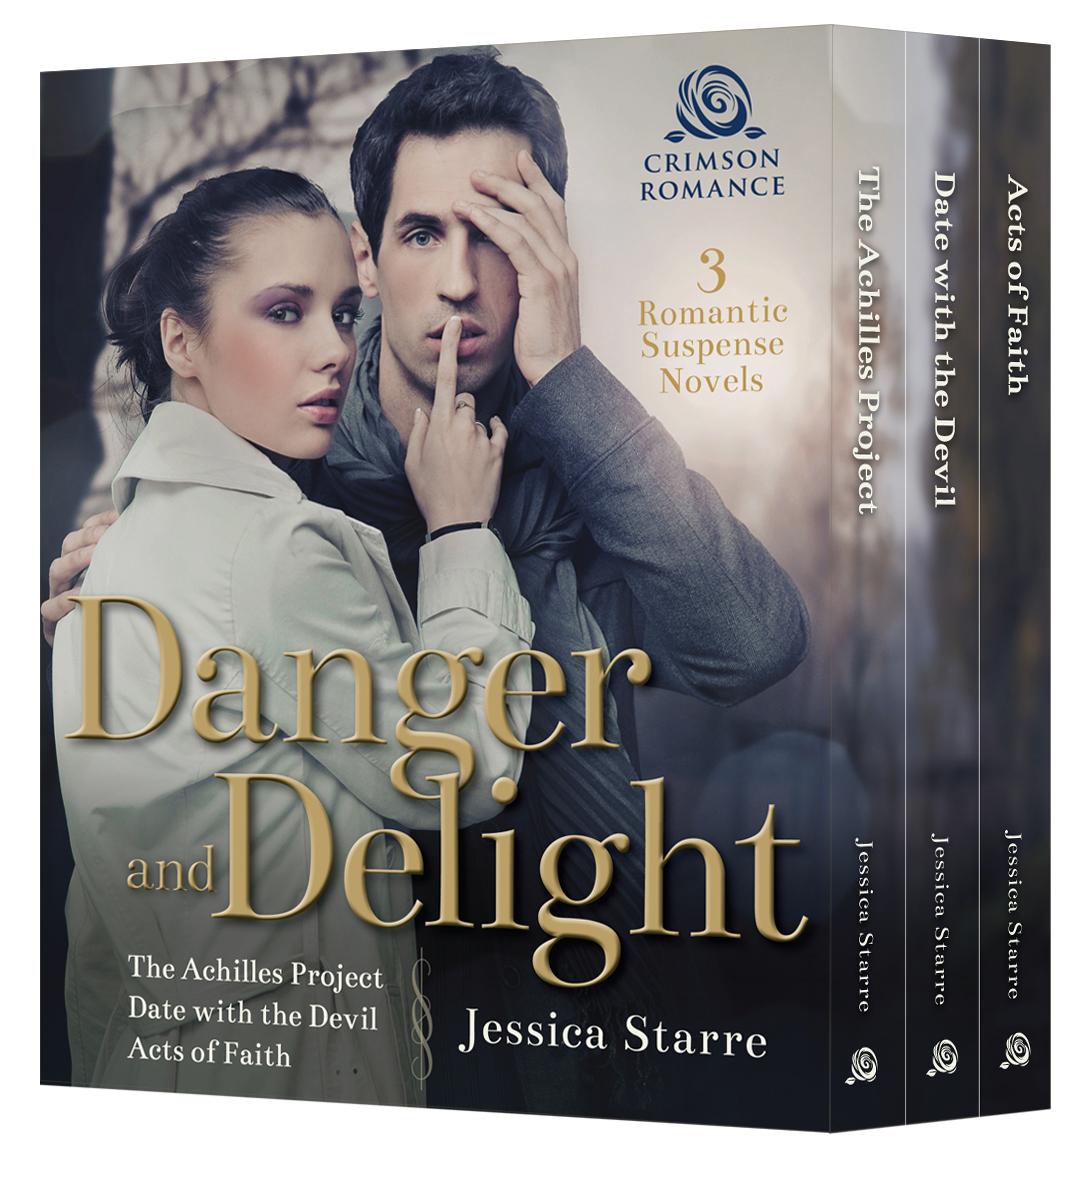 Danger and Delight: 3 Romantic Suspense Novels Jessica Starre